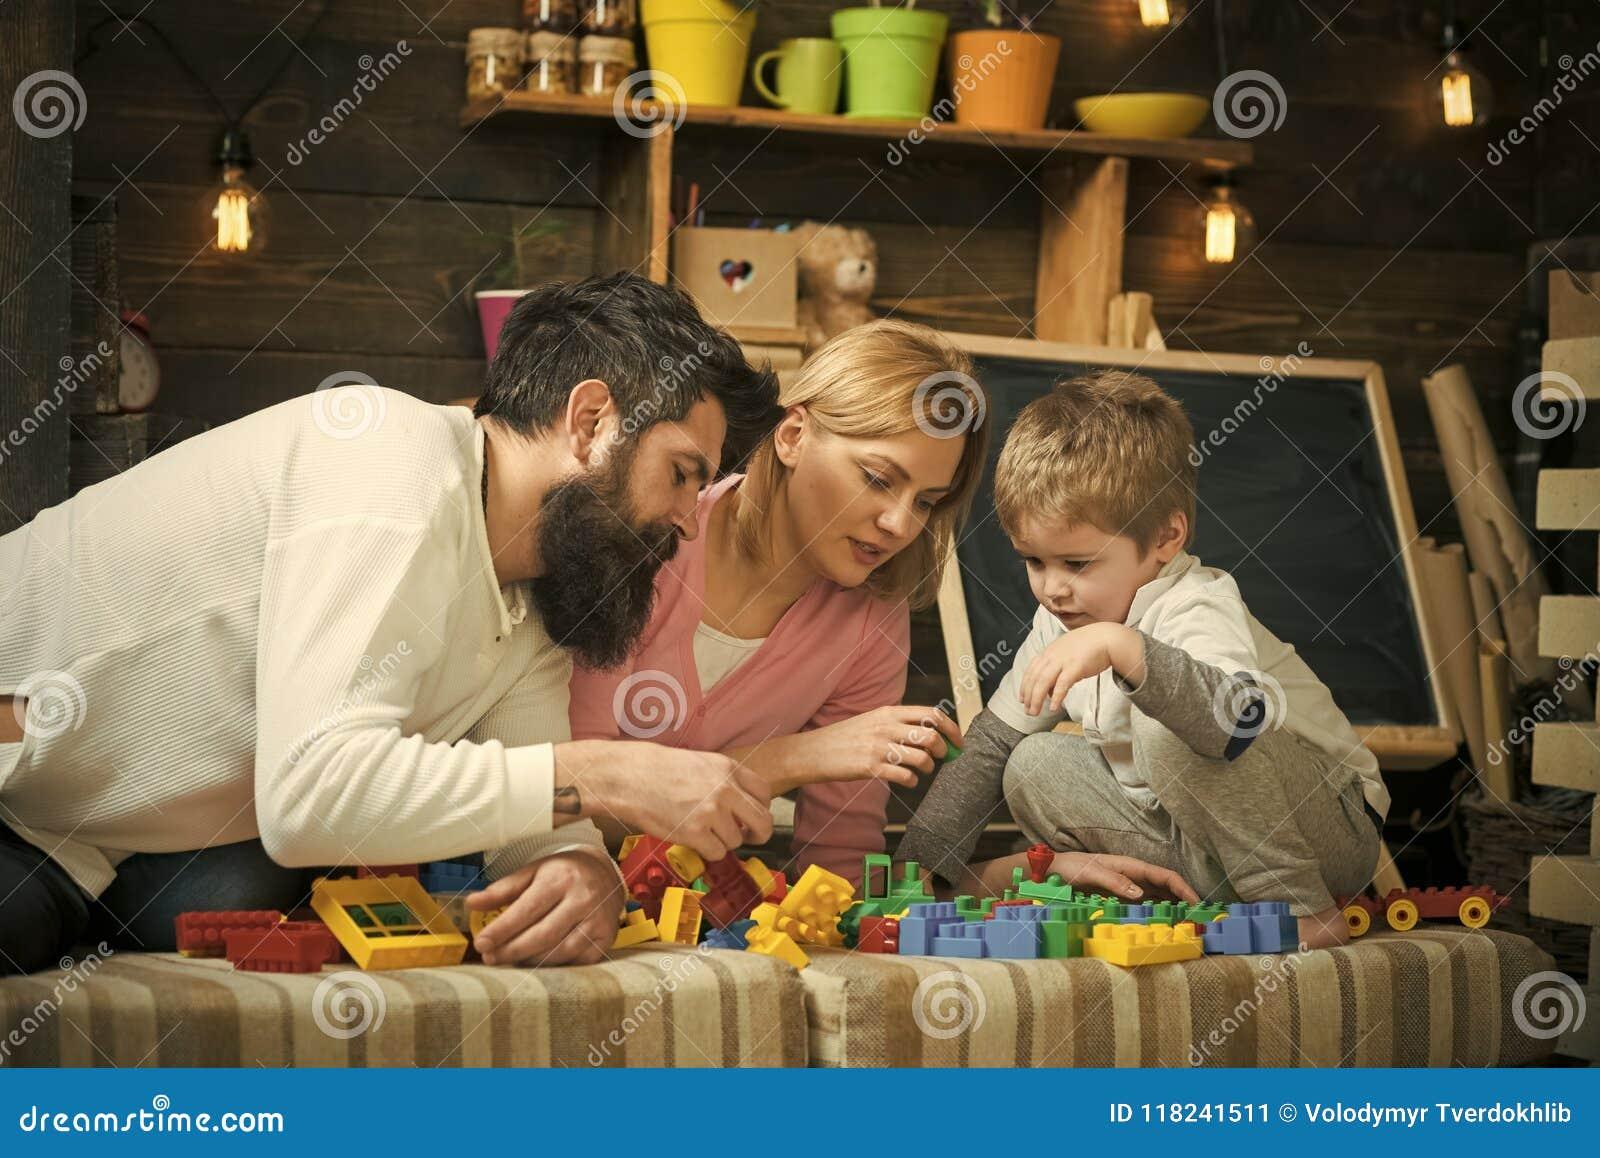 Childcare προσχολική εκπαίδευση Πατέρας, μητέρα και χαριτωμένο παιχνίδι γιων με τα τούβλα κατασκευαστών Η οικογένεια στο πολυάσχο